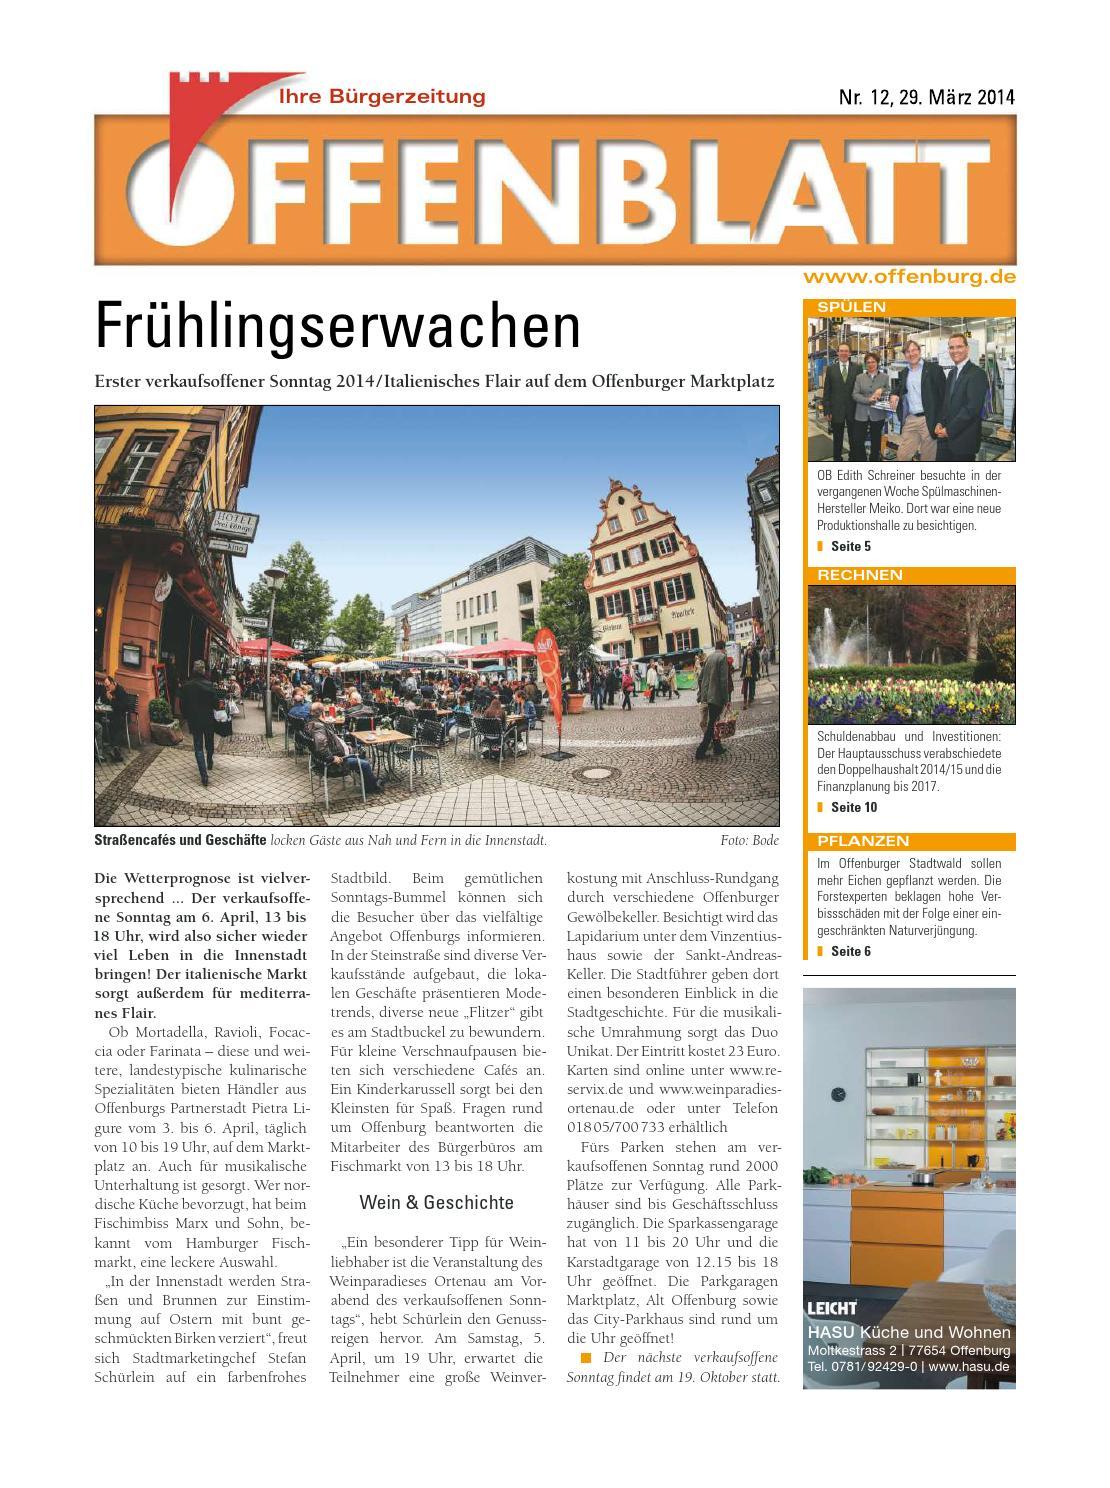 offenblatt 12 2014 by offenburg offenblatt issuu. Black Bedroom Furniture Sets. Home Design Ideas